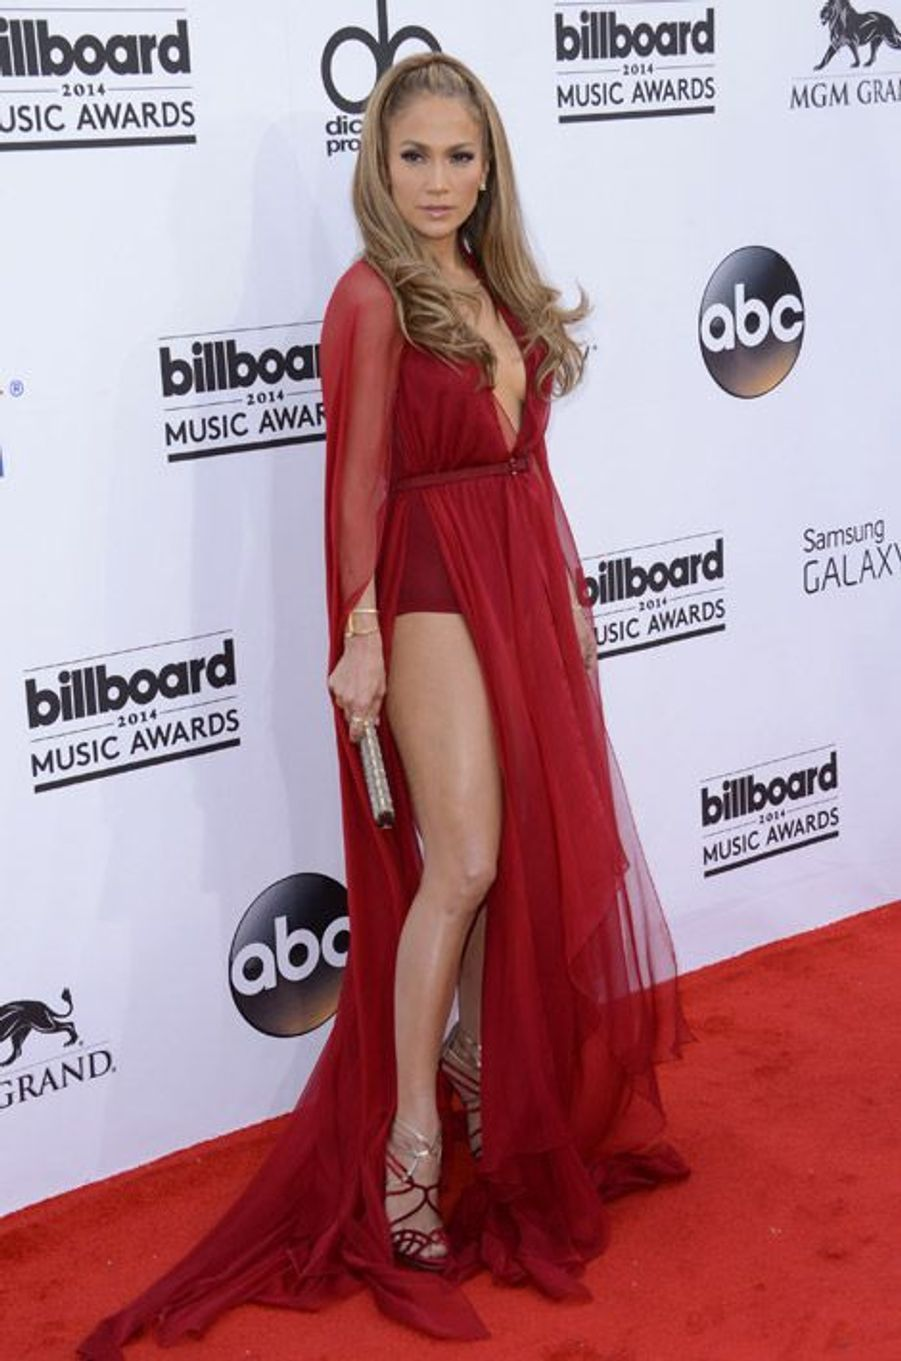 La chanteuse Jennifer Lopez en Jimmy Choo lors de la cérémonie Billboard Music Awards, le 18 mai 2014